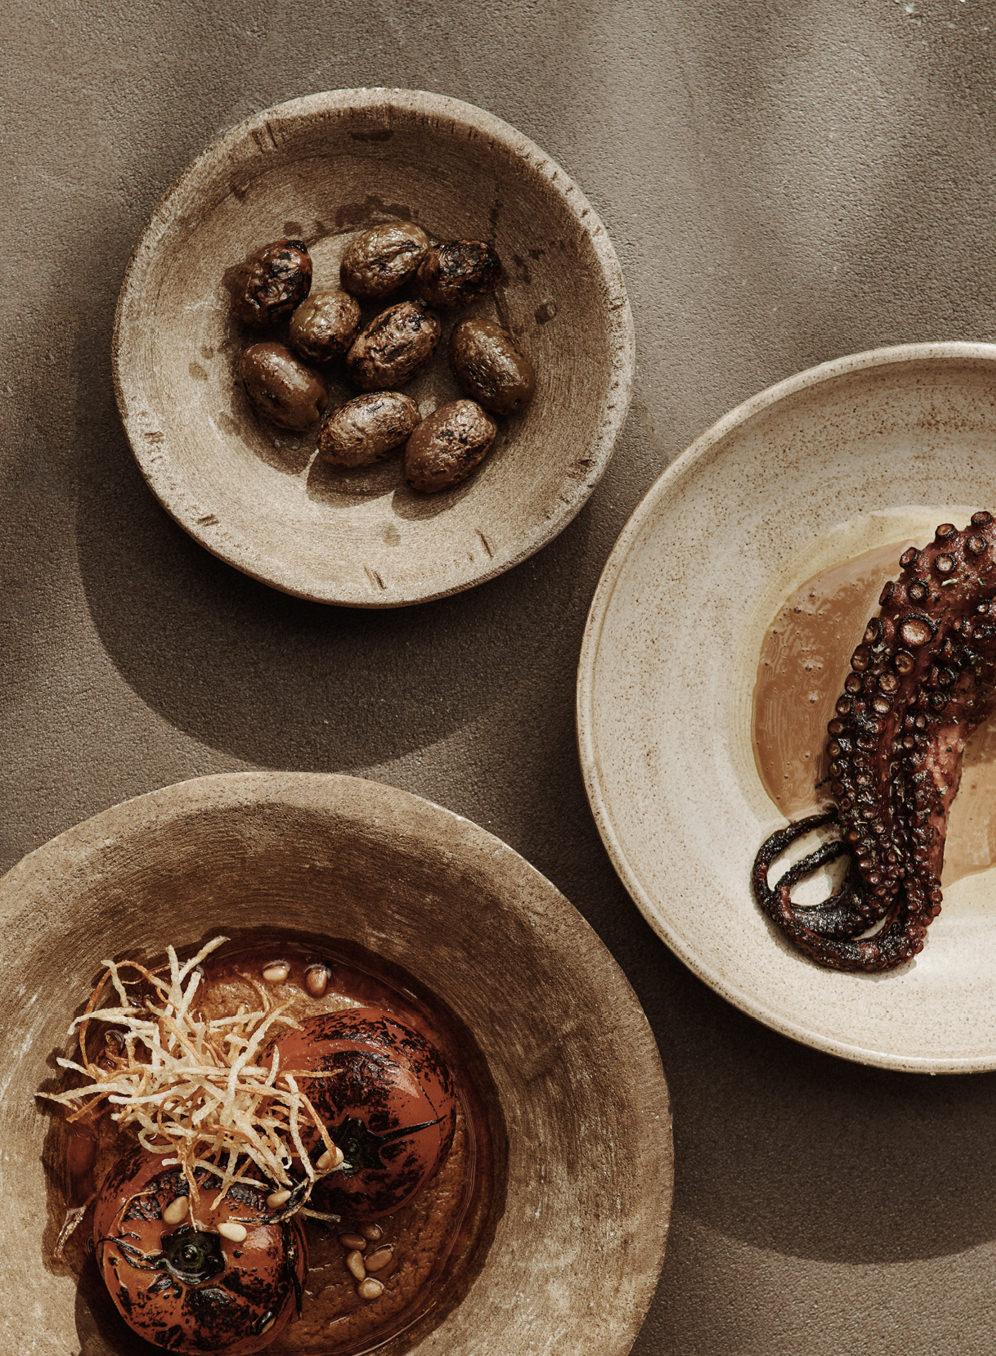 Noema Restaurant & Bar Mykonos designed by Lambs and Lions Berlin, Food